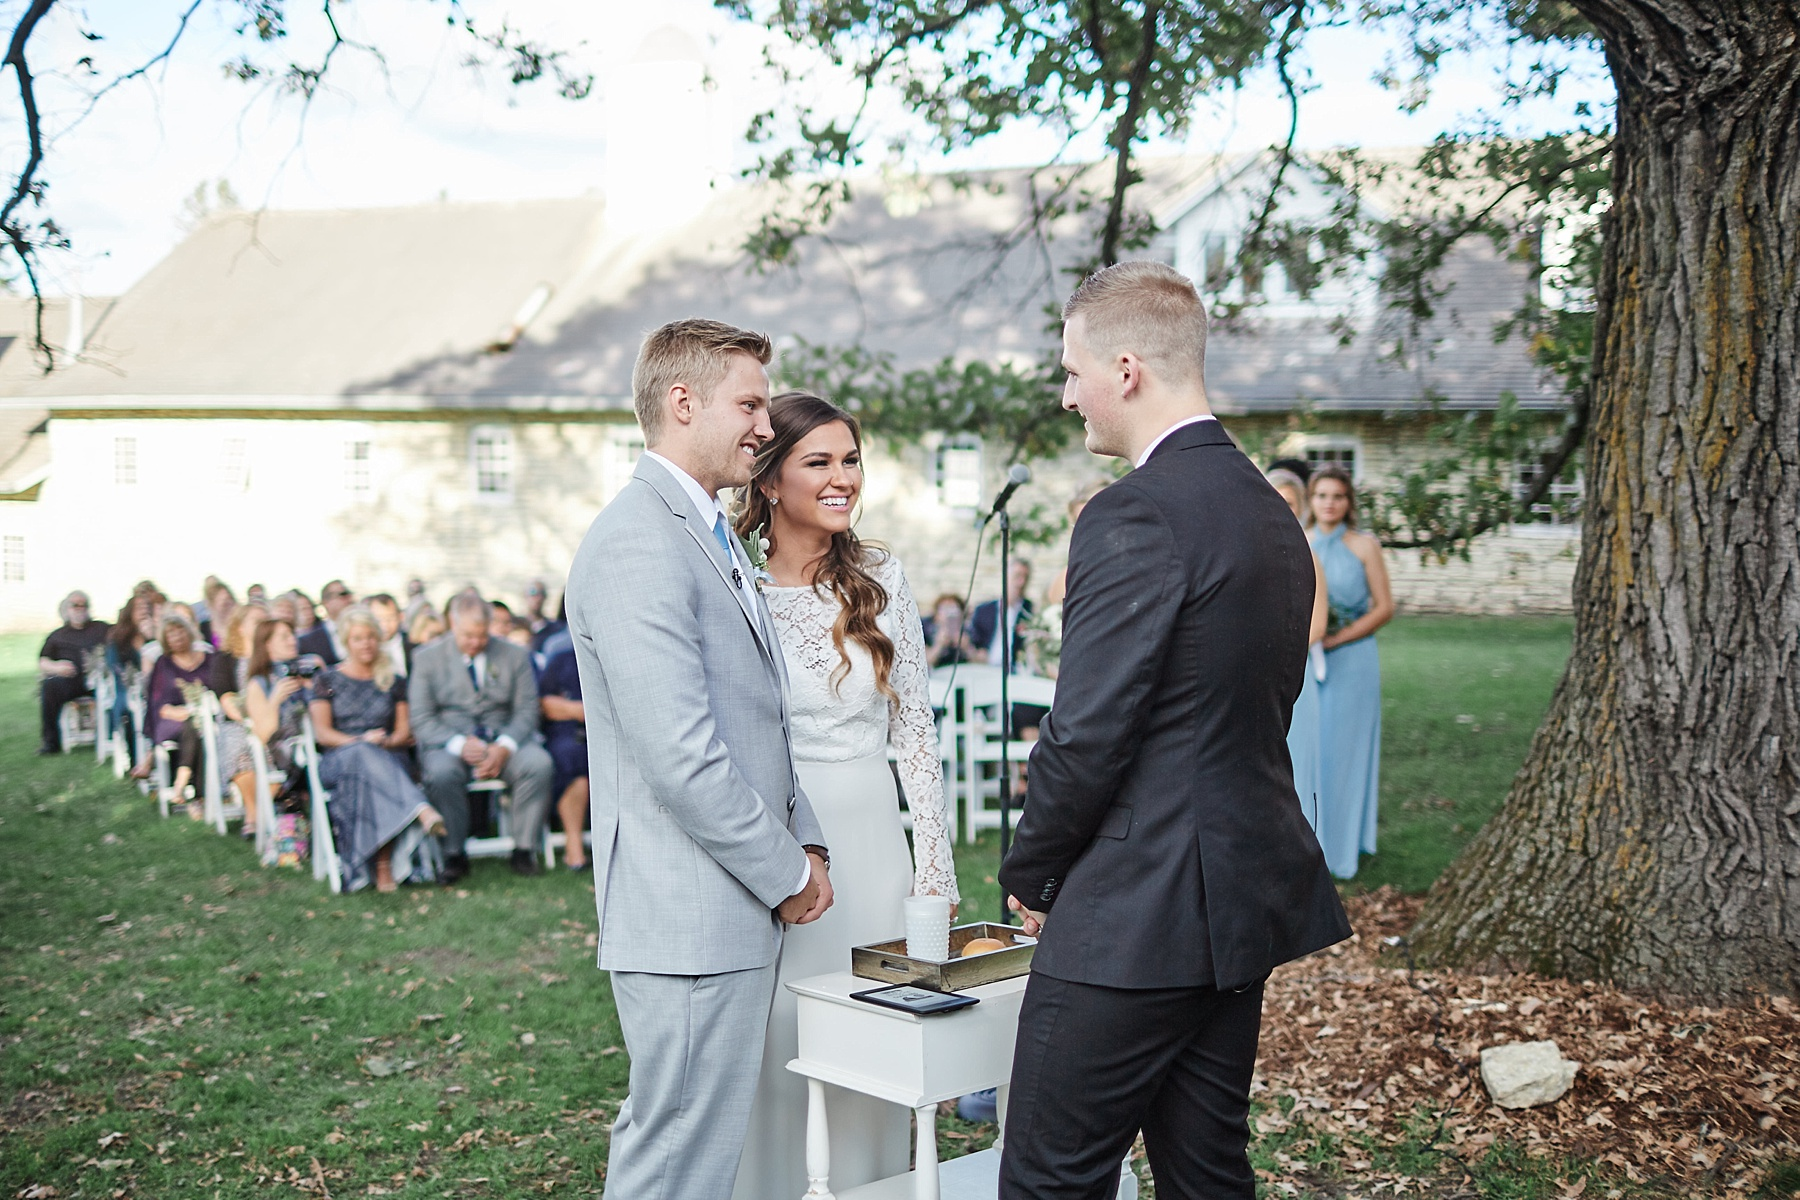 Maywood-Stone-Barn-Wedding-Rochester-Minnesota-Perry-James-Photo_0650.jpg